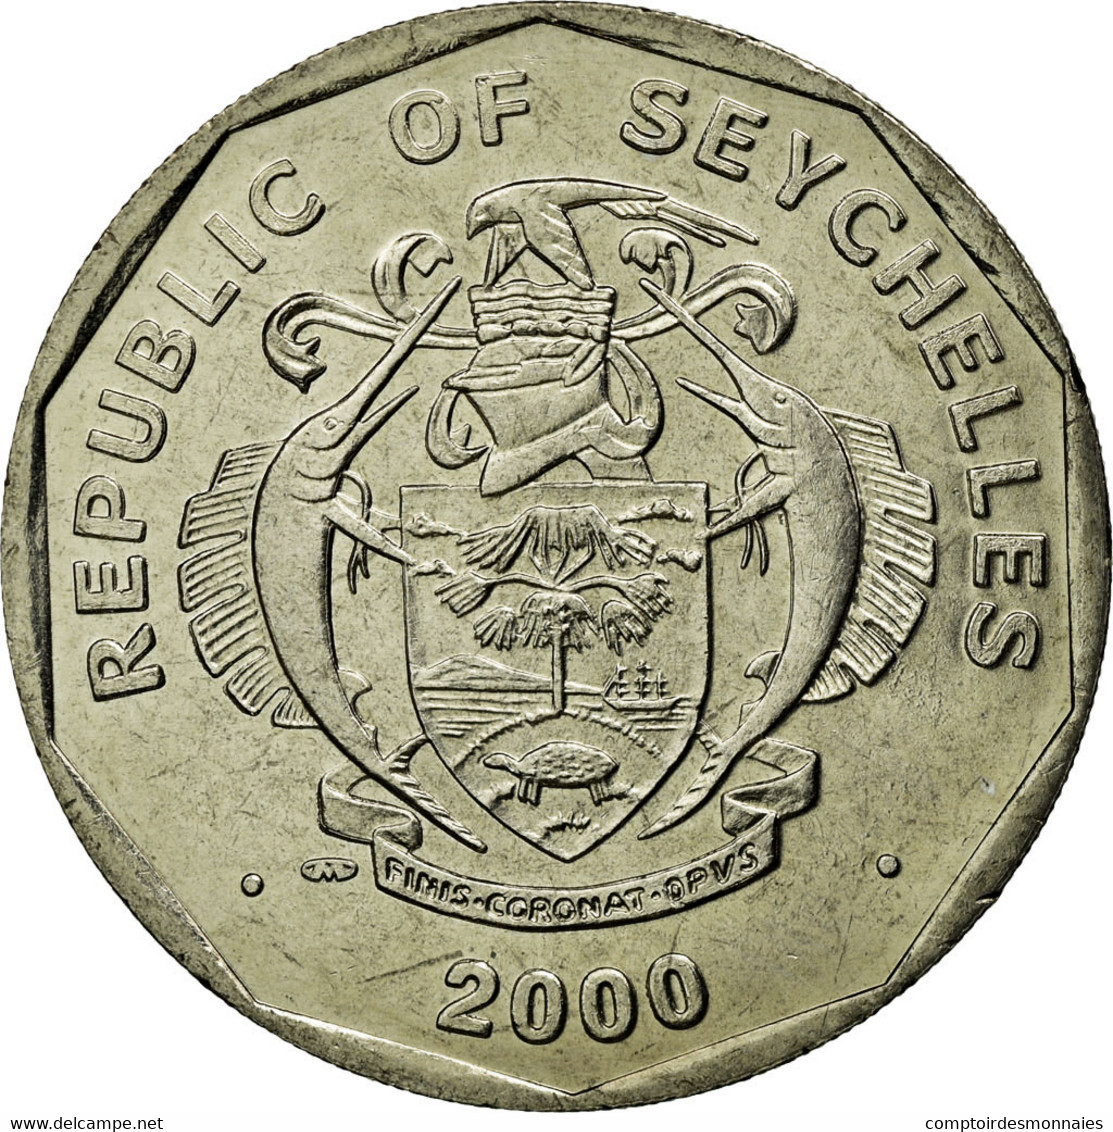 Monnaie, Seychelles, 5 Rupees, 2000, British Royal Mint, SPL, Copper-nickel - Seychelles